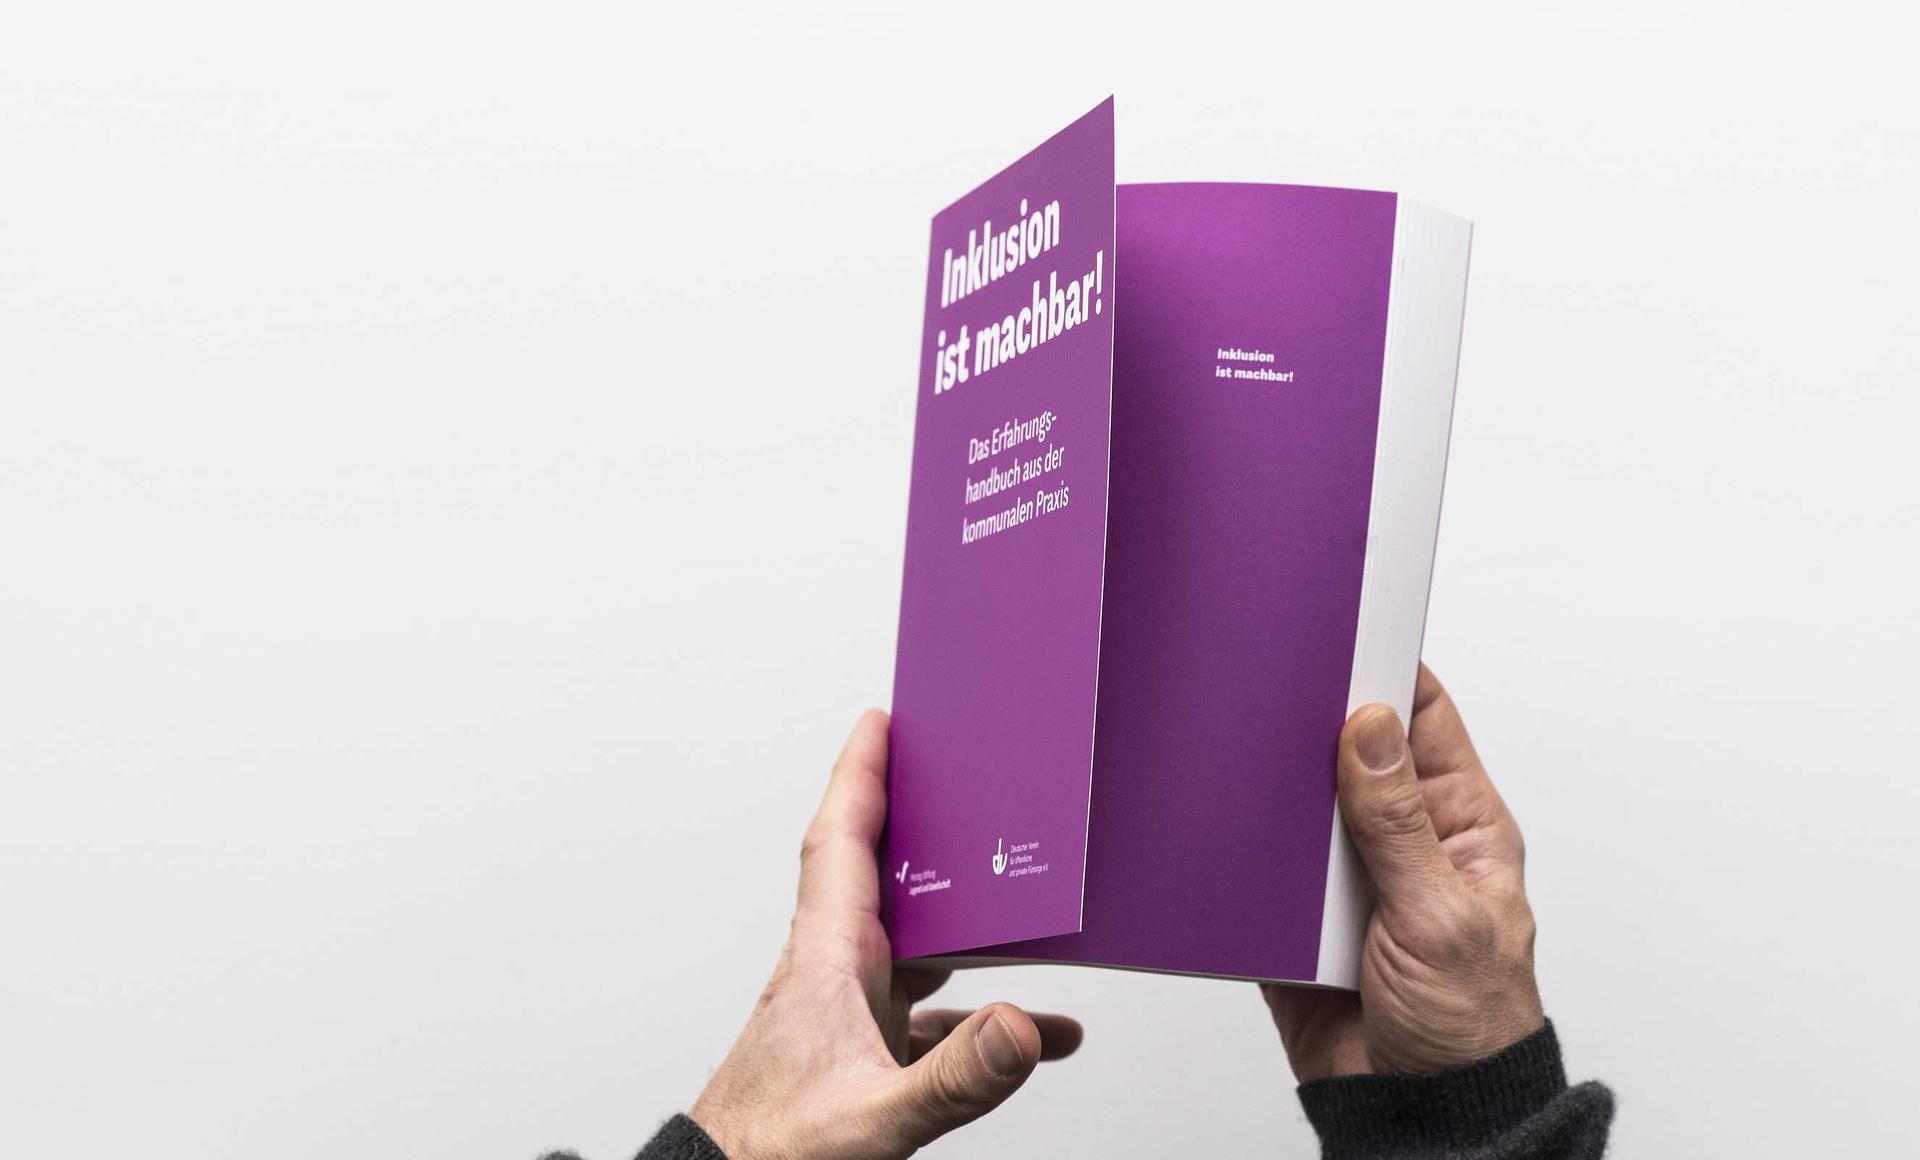 inclusion-fieldbook-2-2650x1600px